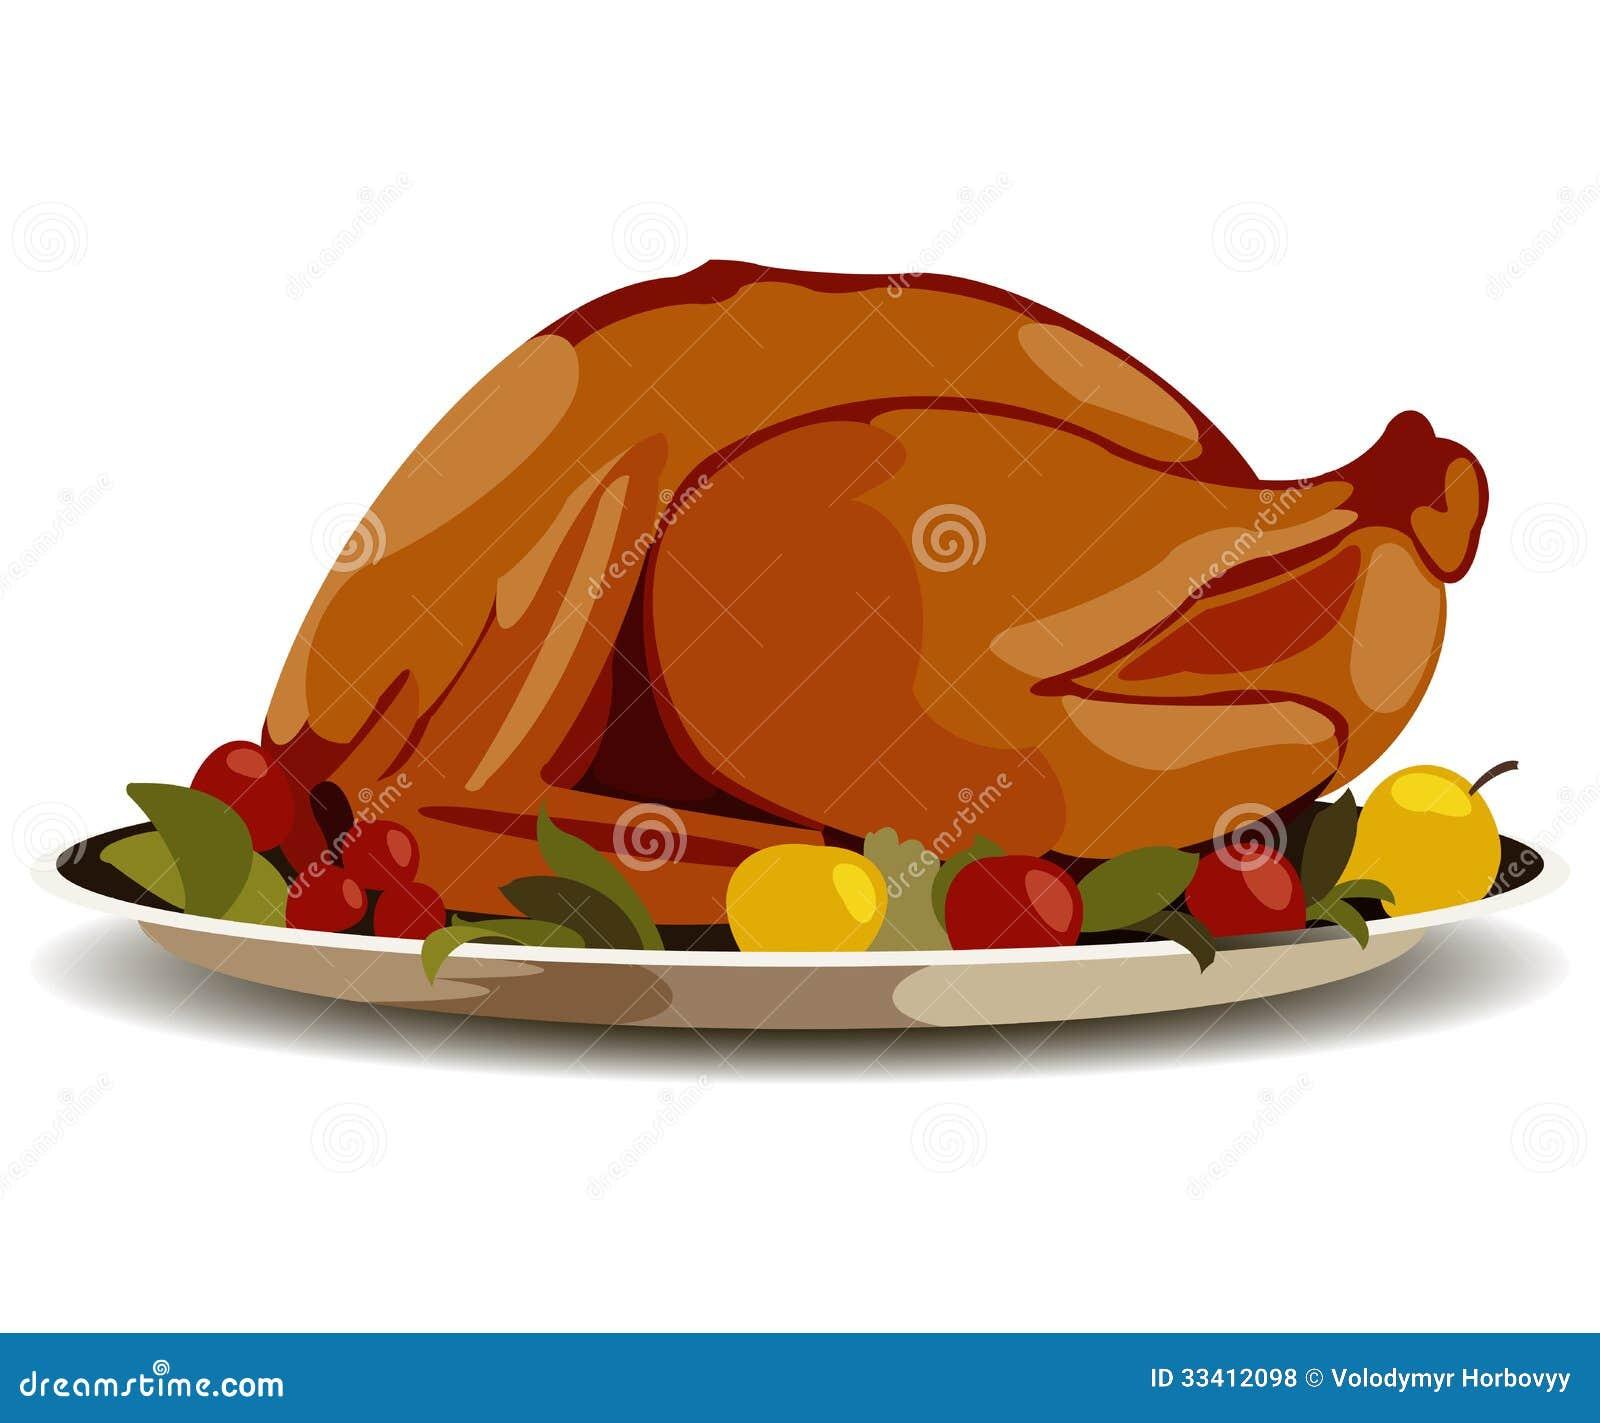 Thanksgiving Royalty Free Stock Photos Image 33412098